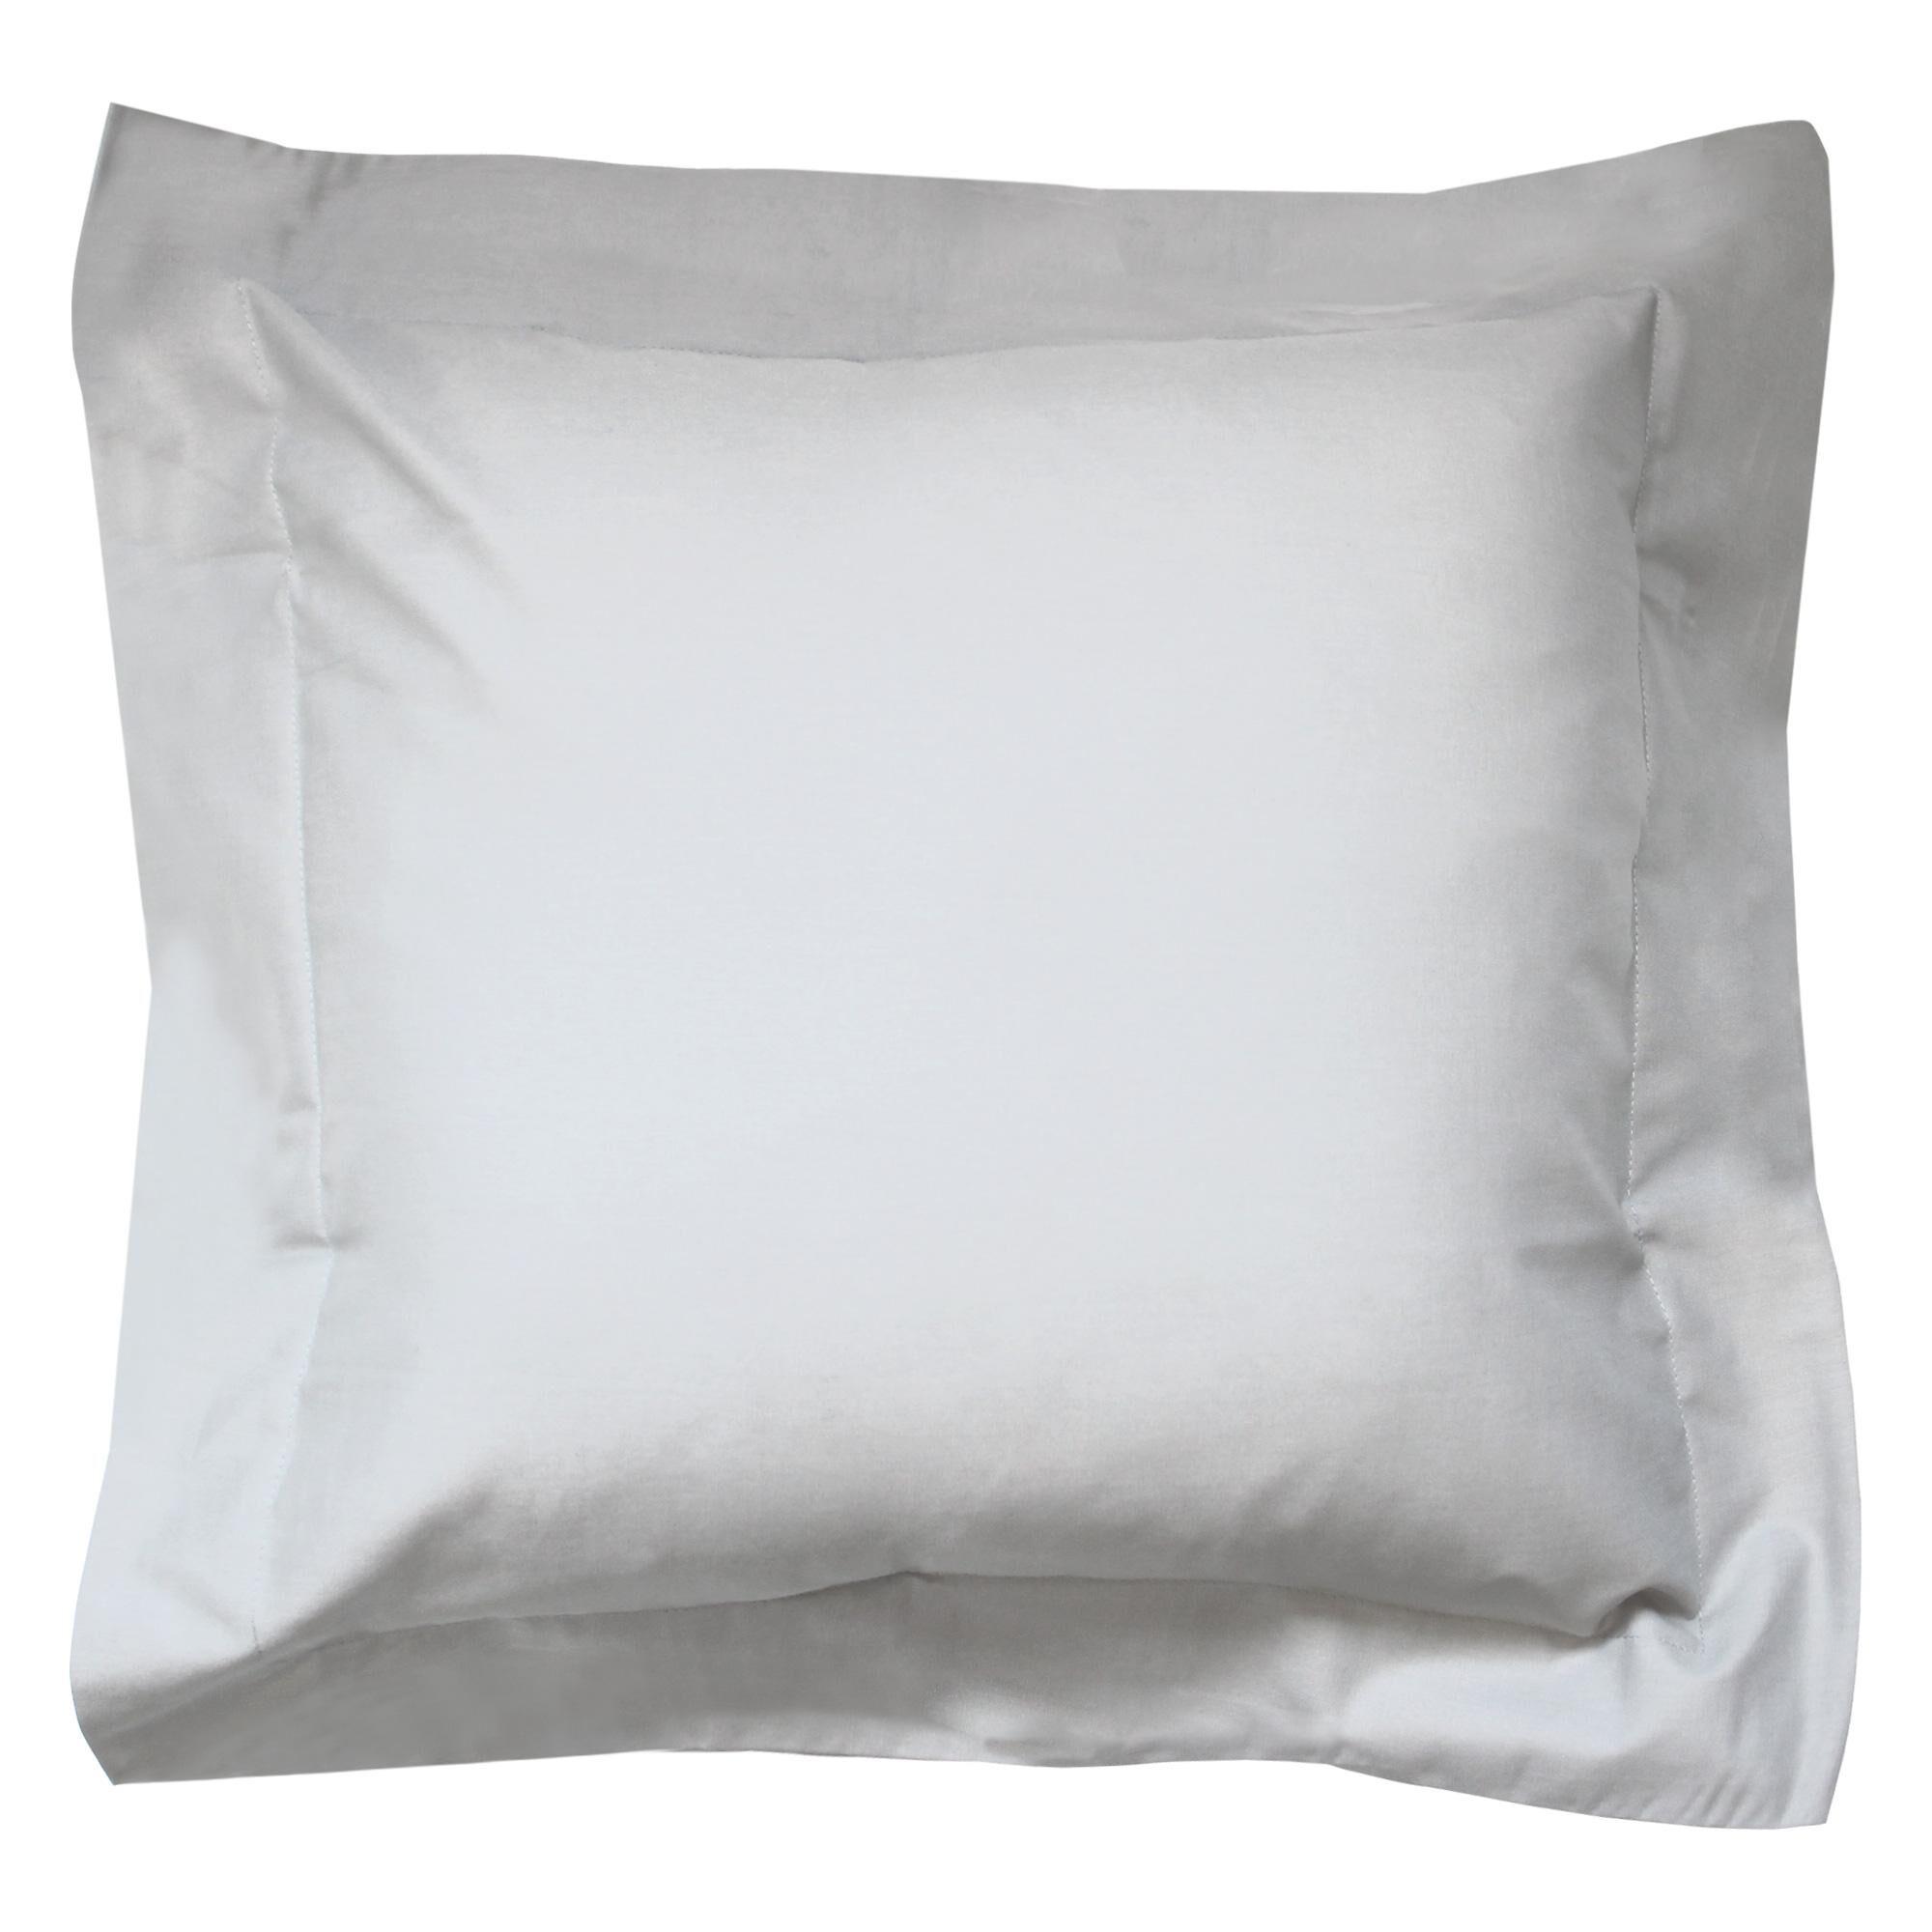 Linnea Taie d'oreiller uni 40x40 cm 100% coton ALTO Calcium